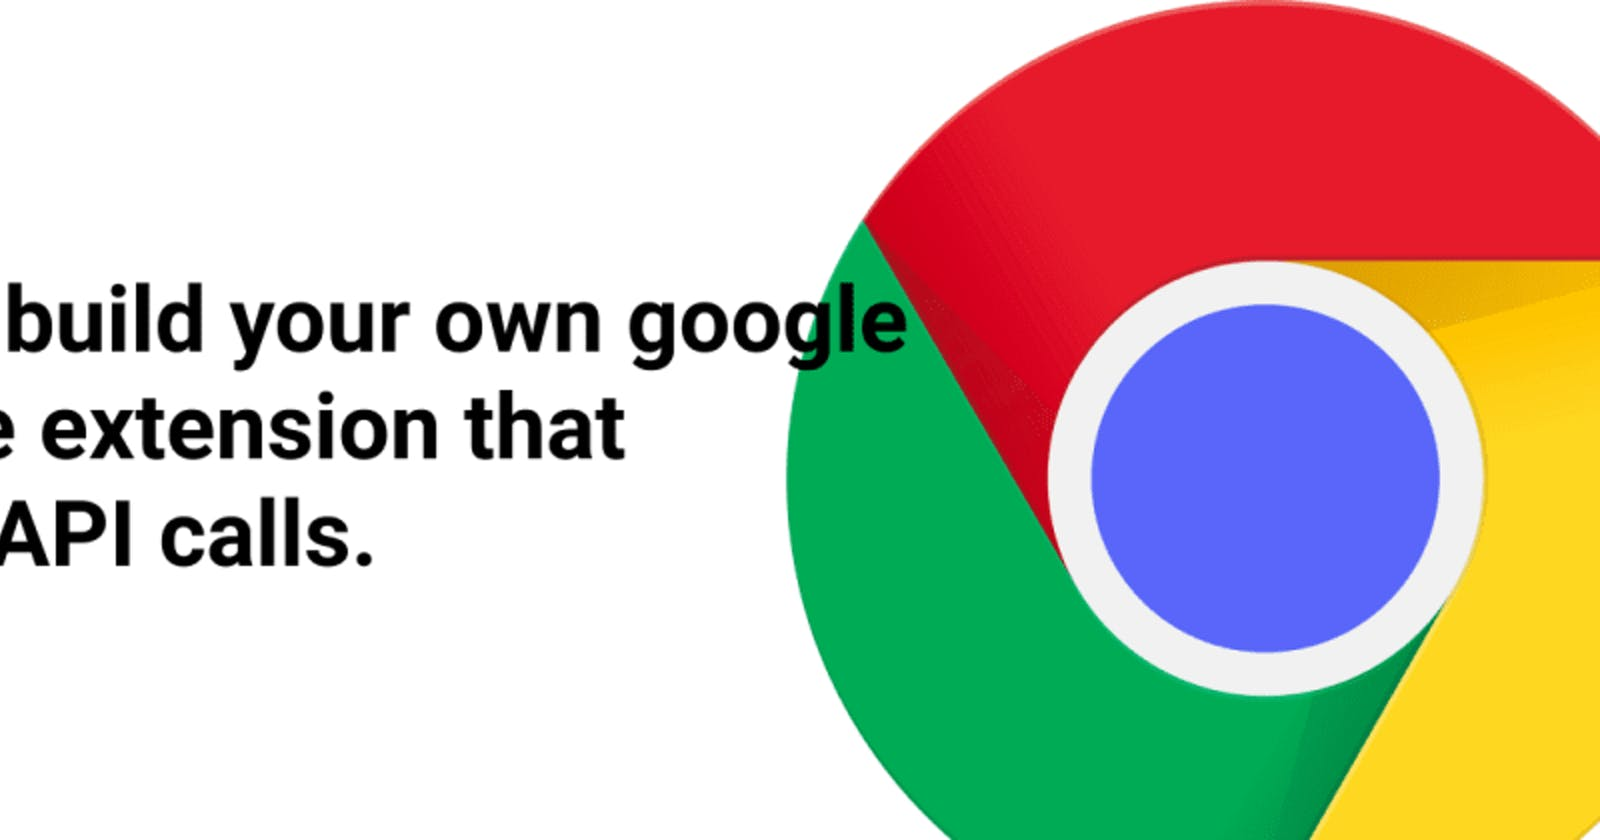 How to build a Chrome extension that makes API Calls